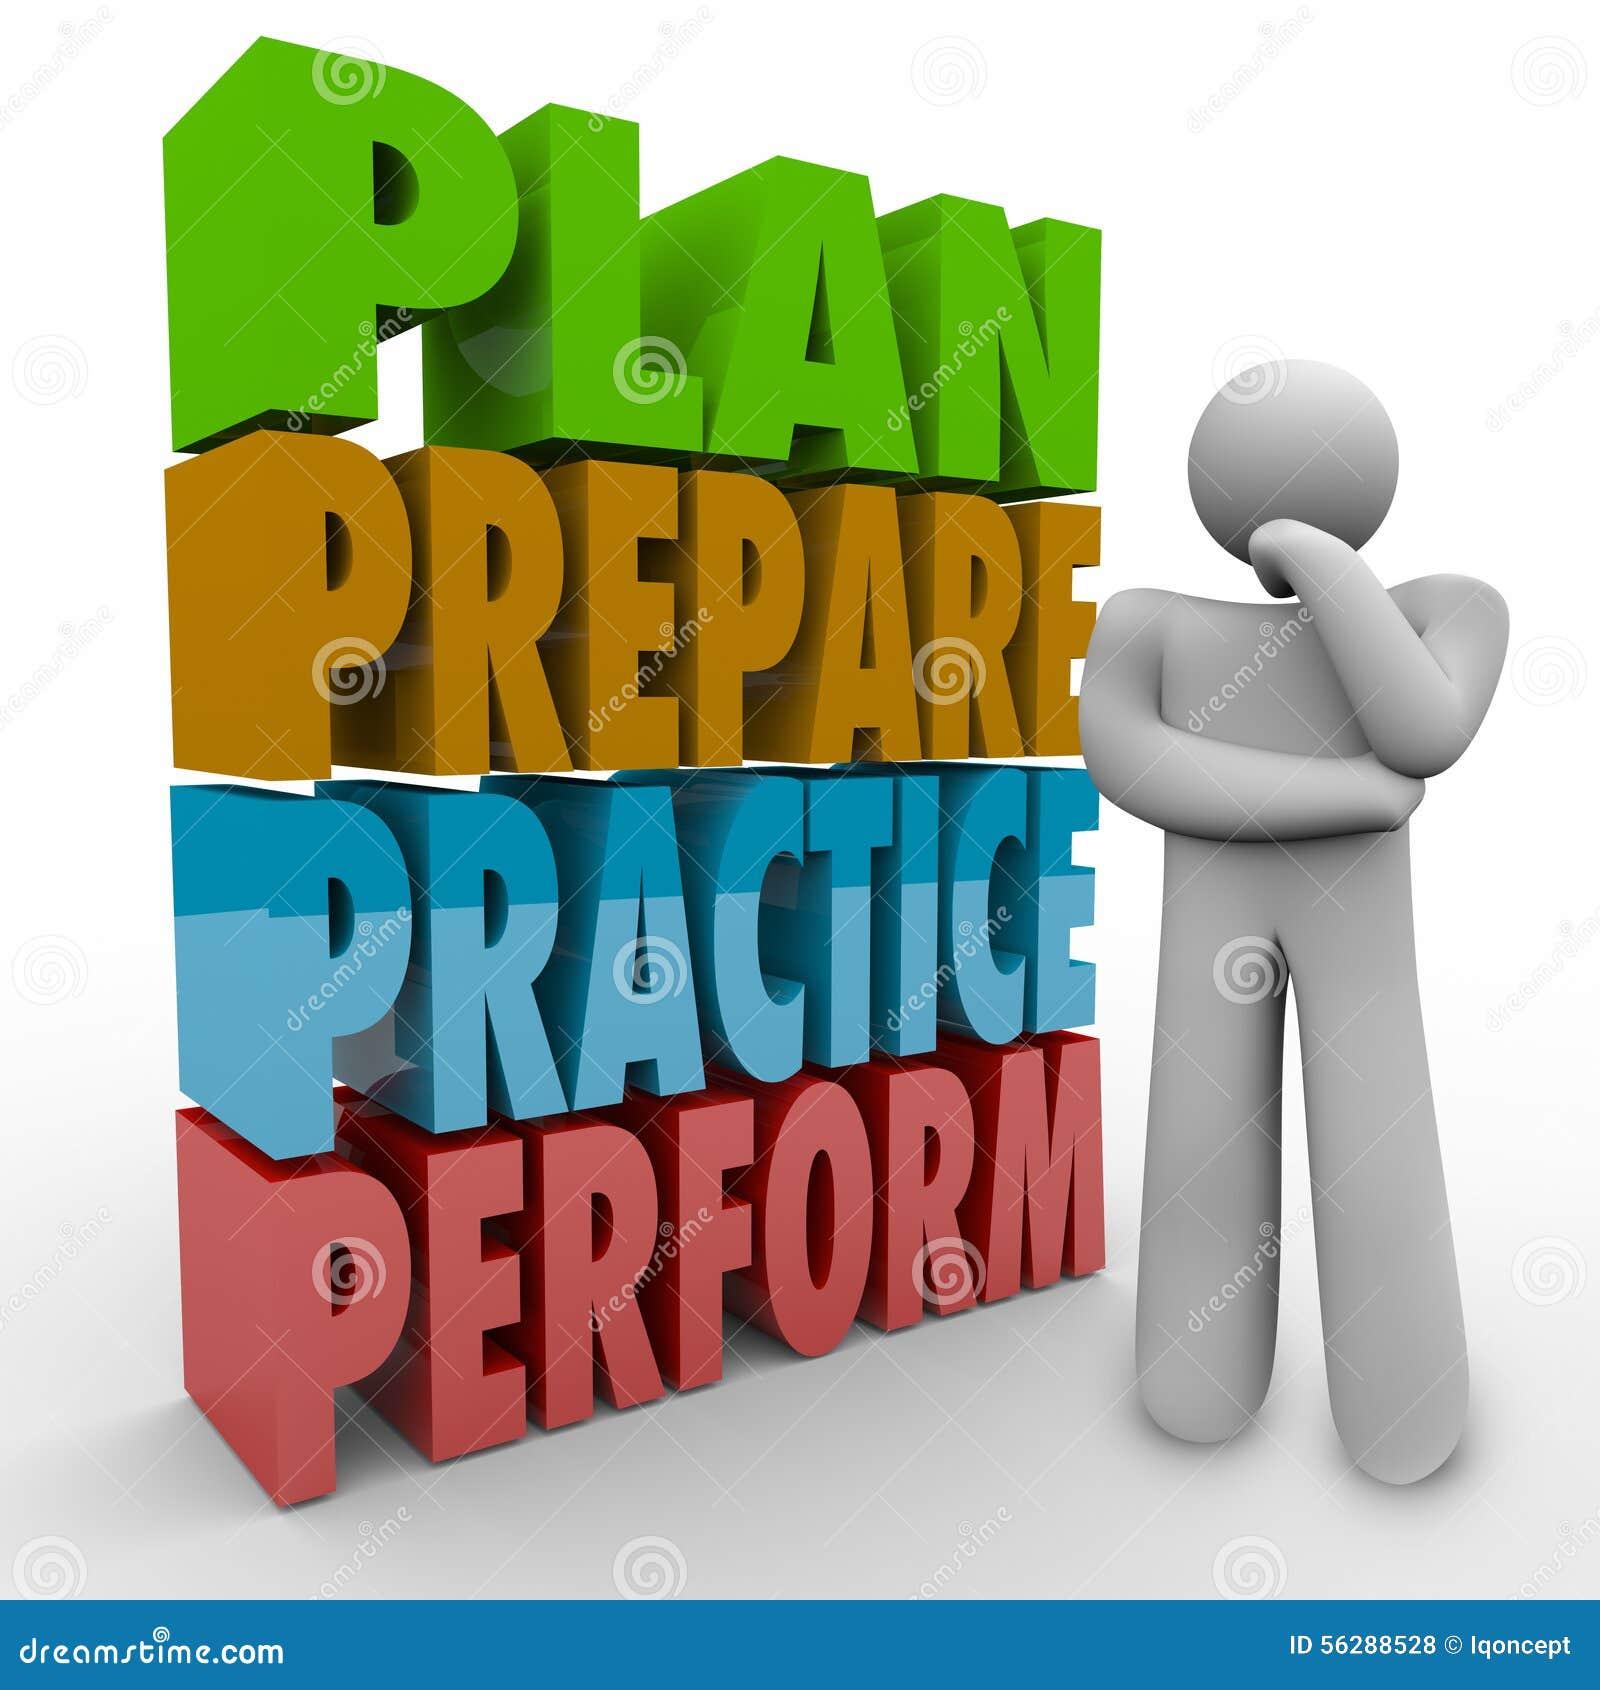 Plan Prepare Practice Perform Thinking Person Strategy Idea Stock Illustration Image 56288528